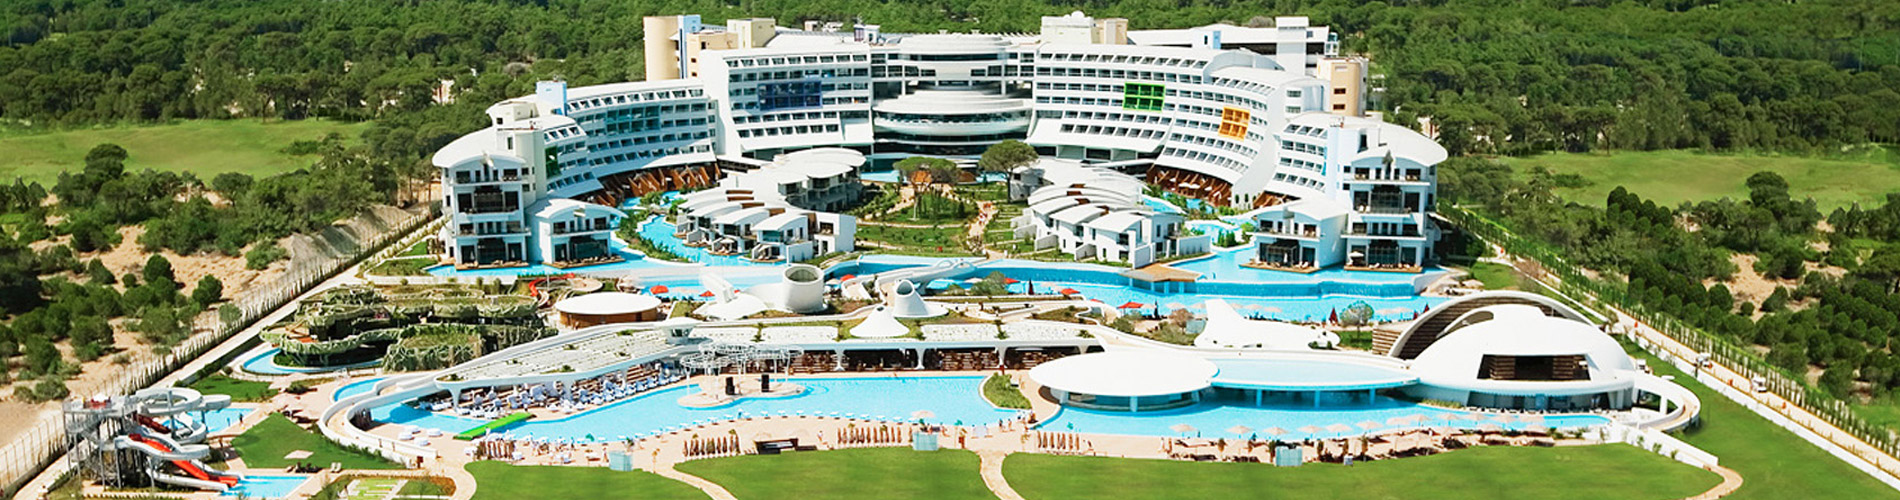 Hotels In Belek All Inclusive